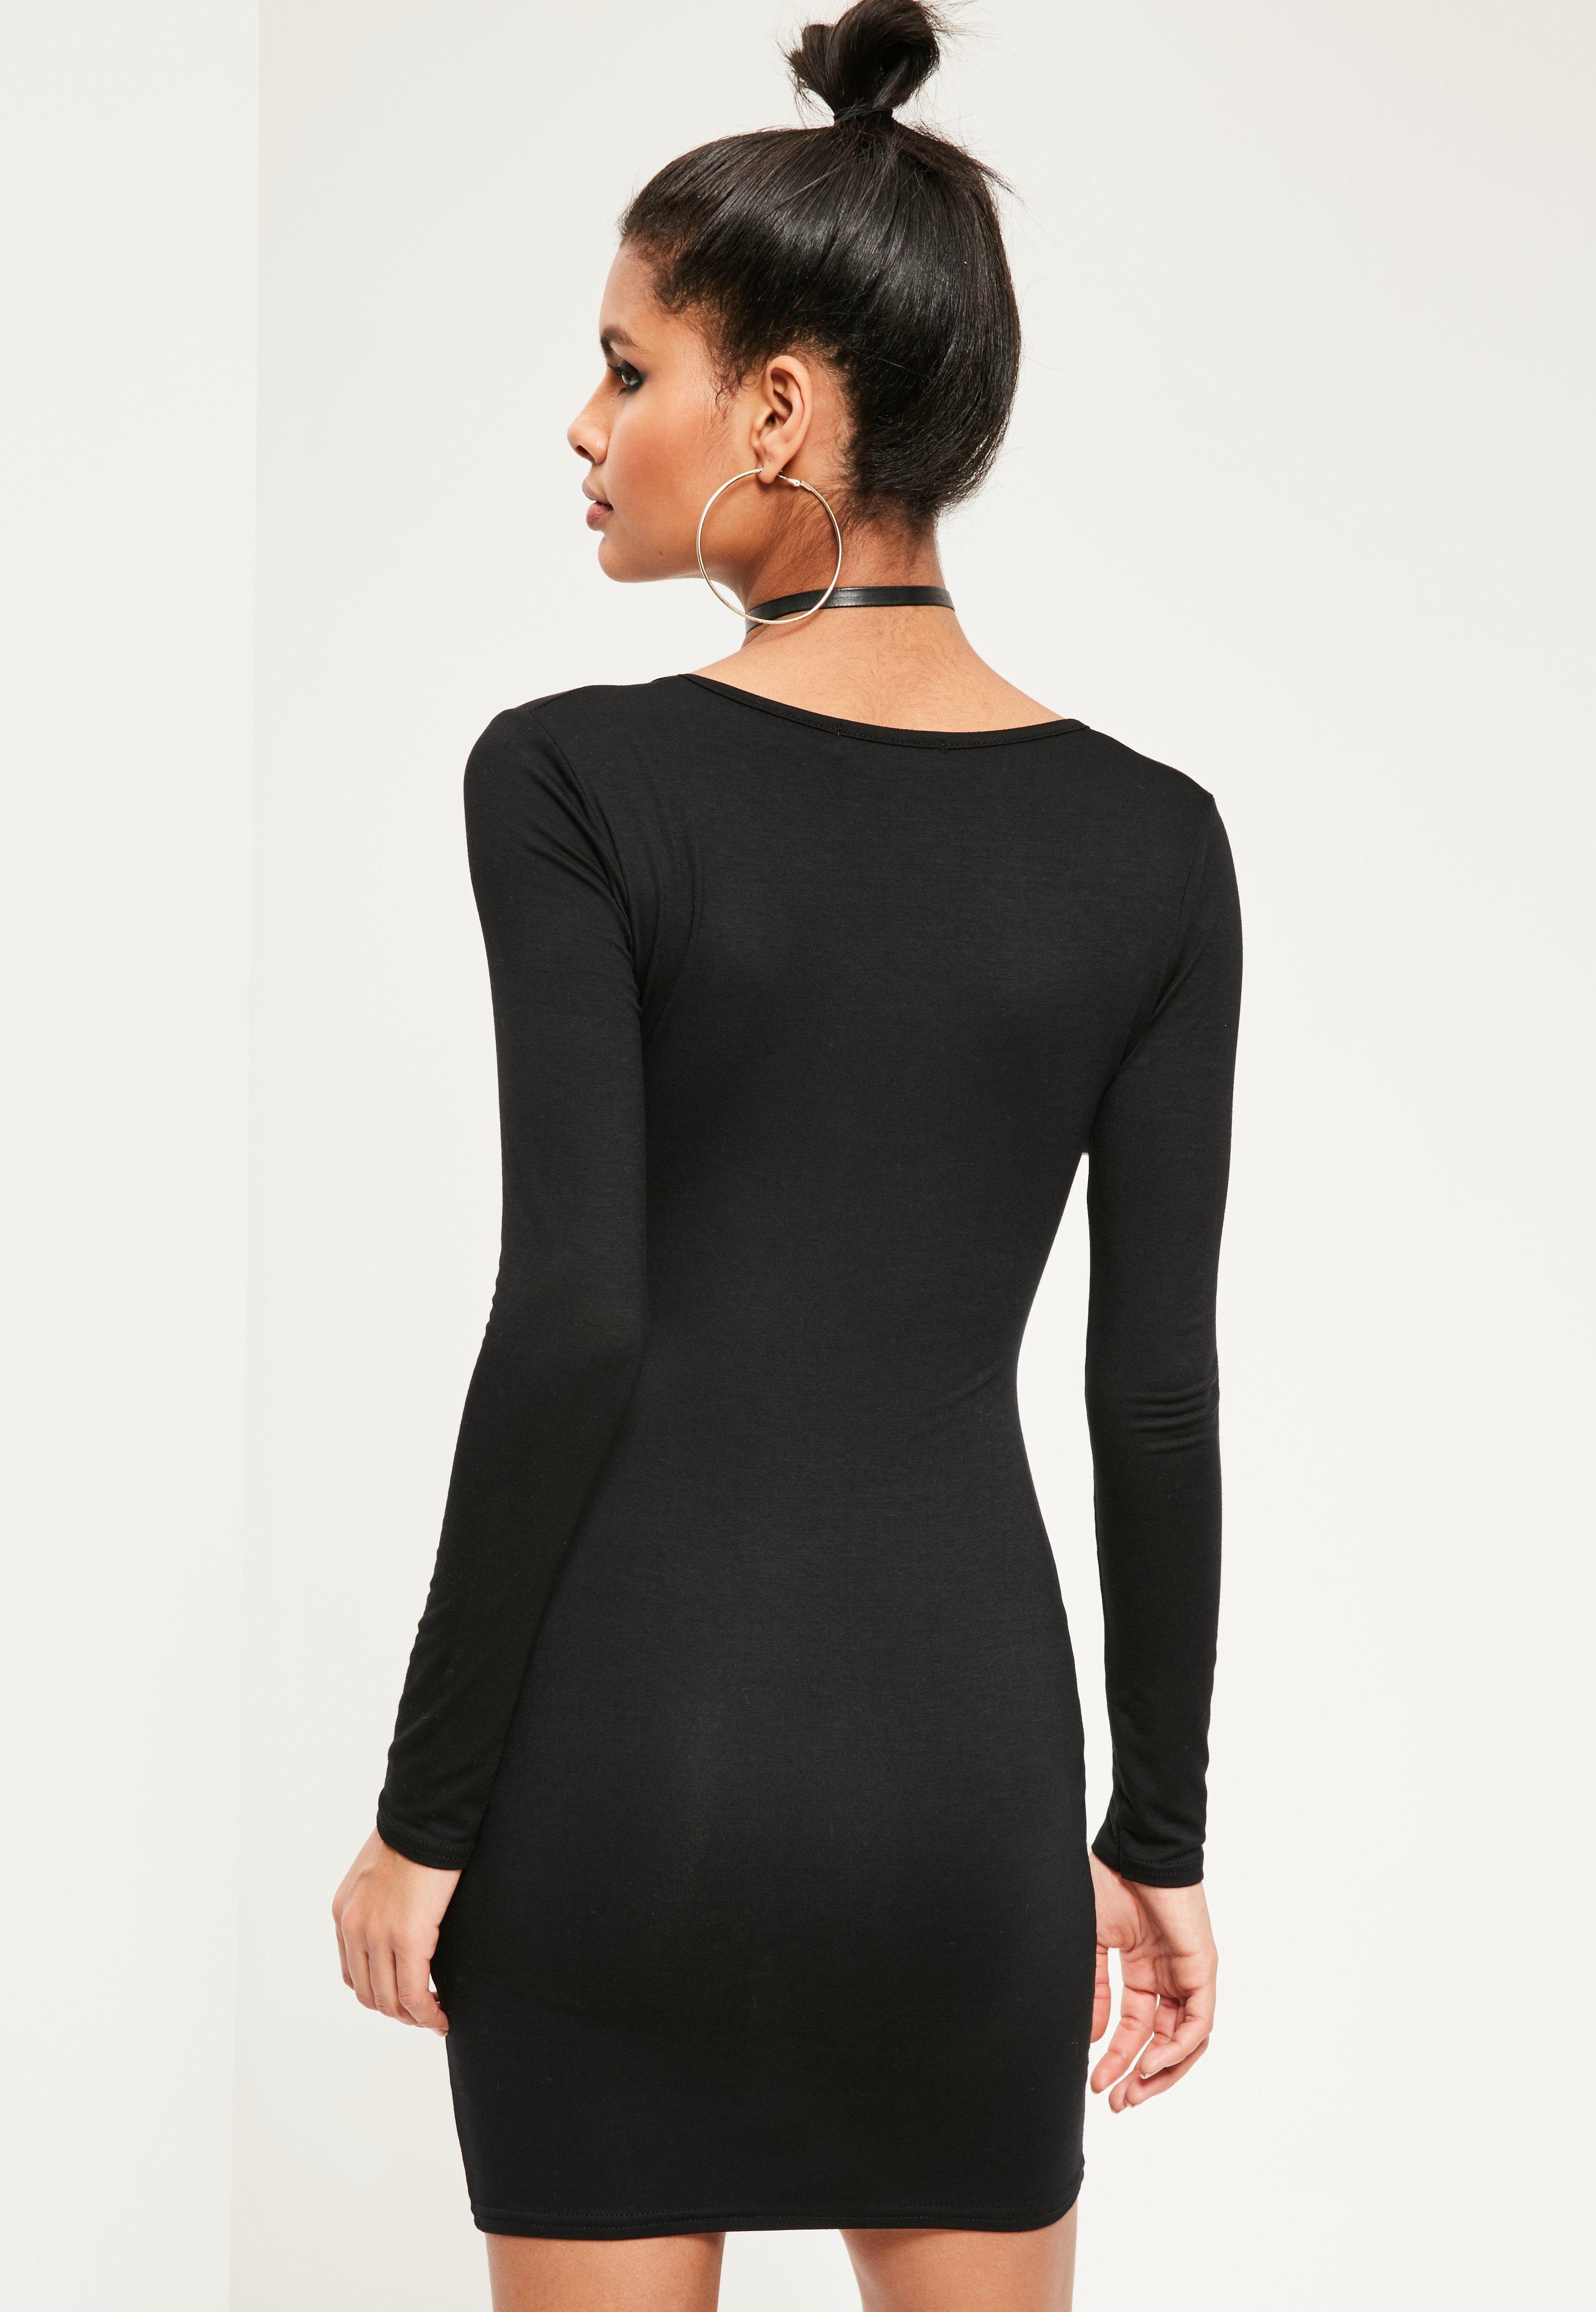 Black Keyhole Long Sleeve Bodycon Dress